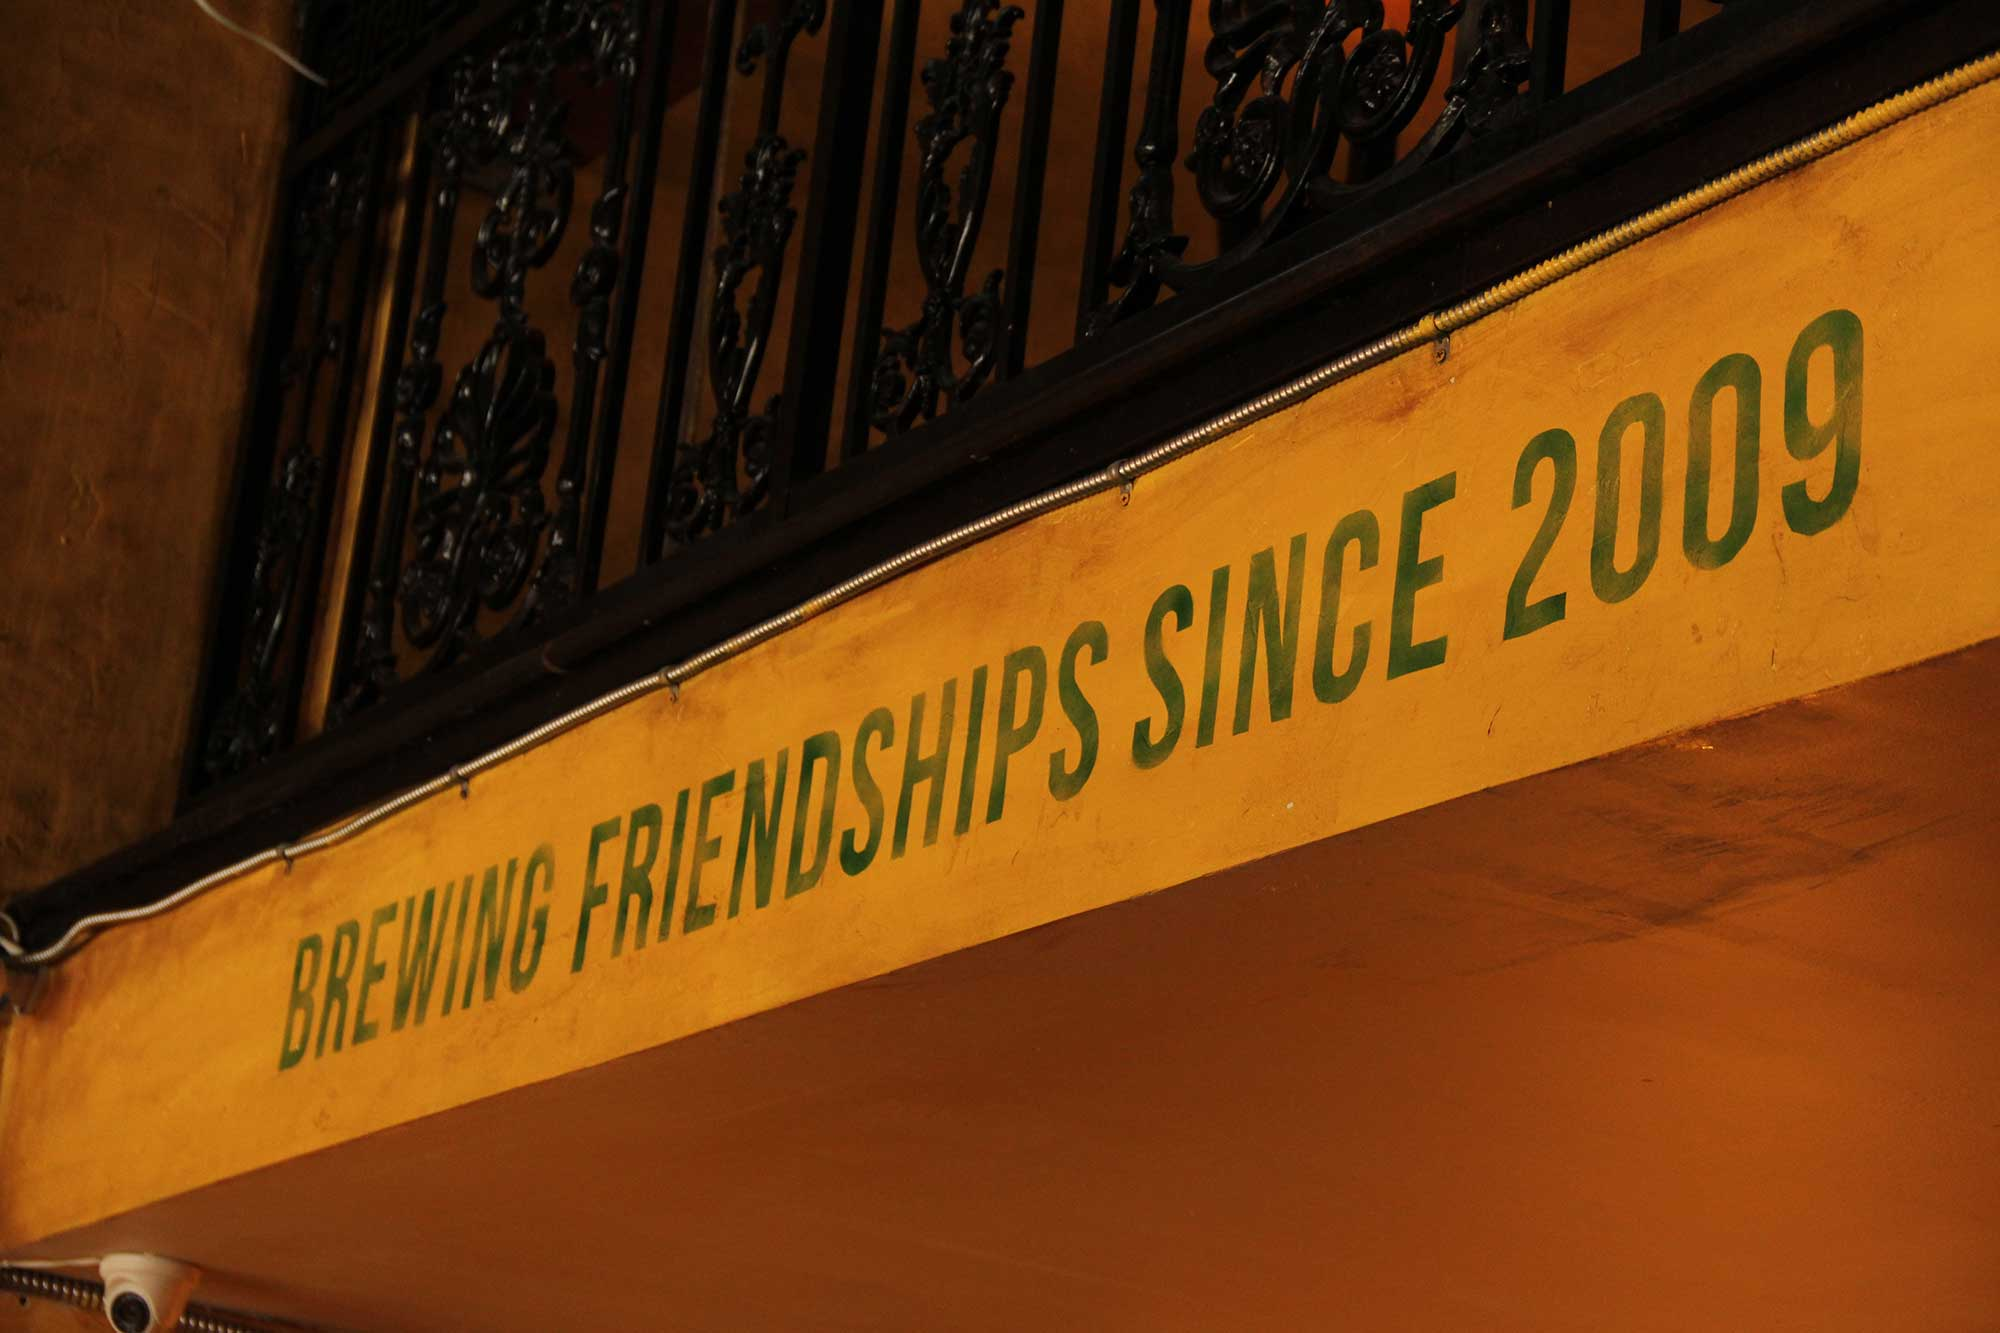 Brewing friendships